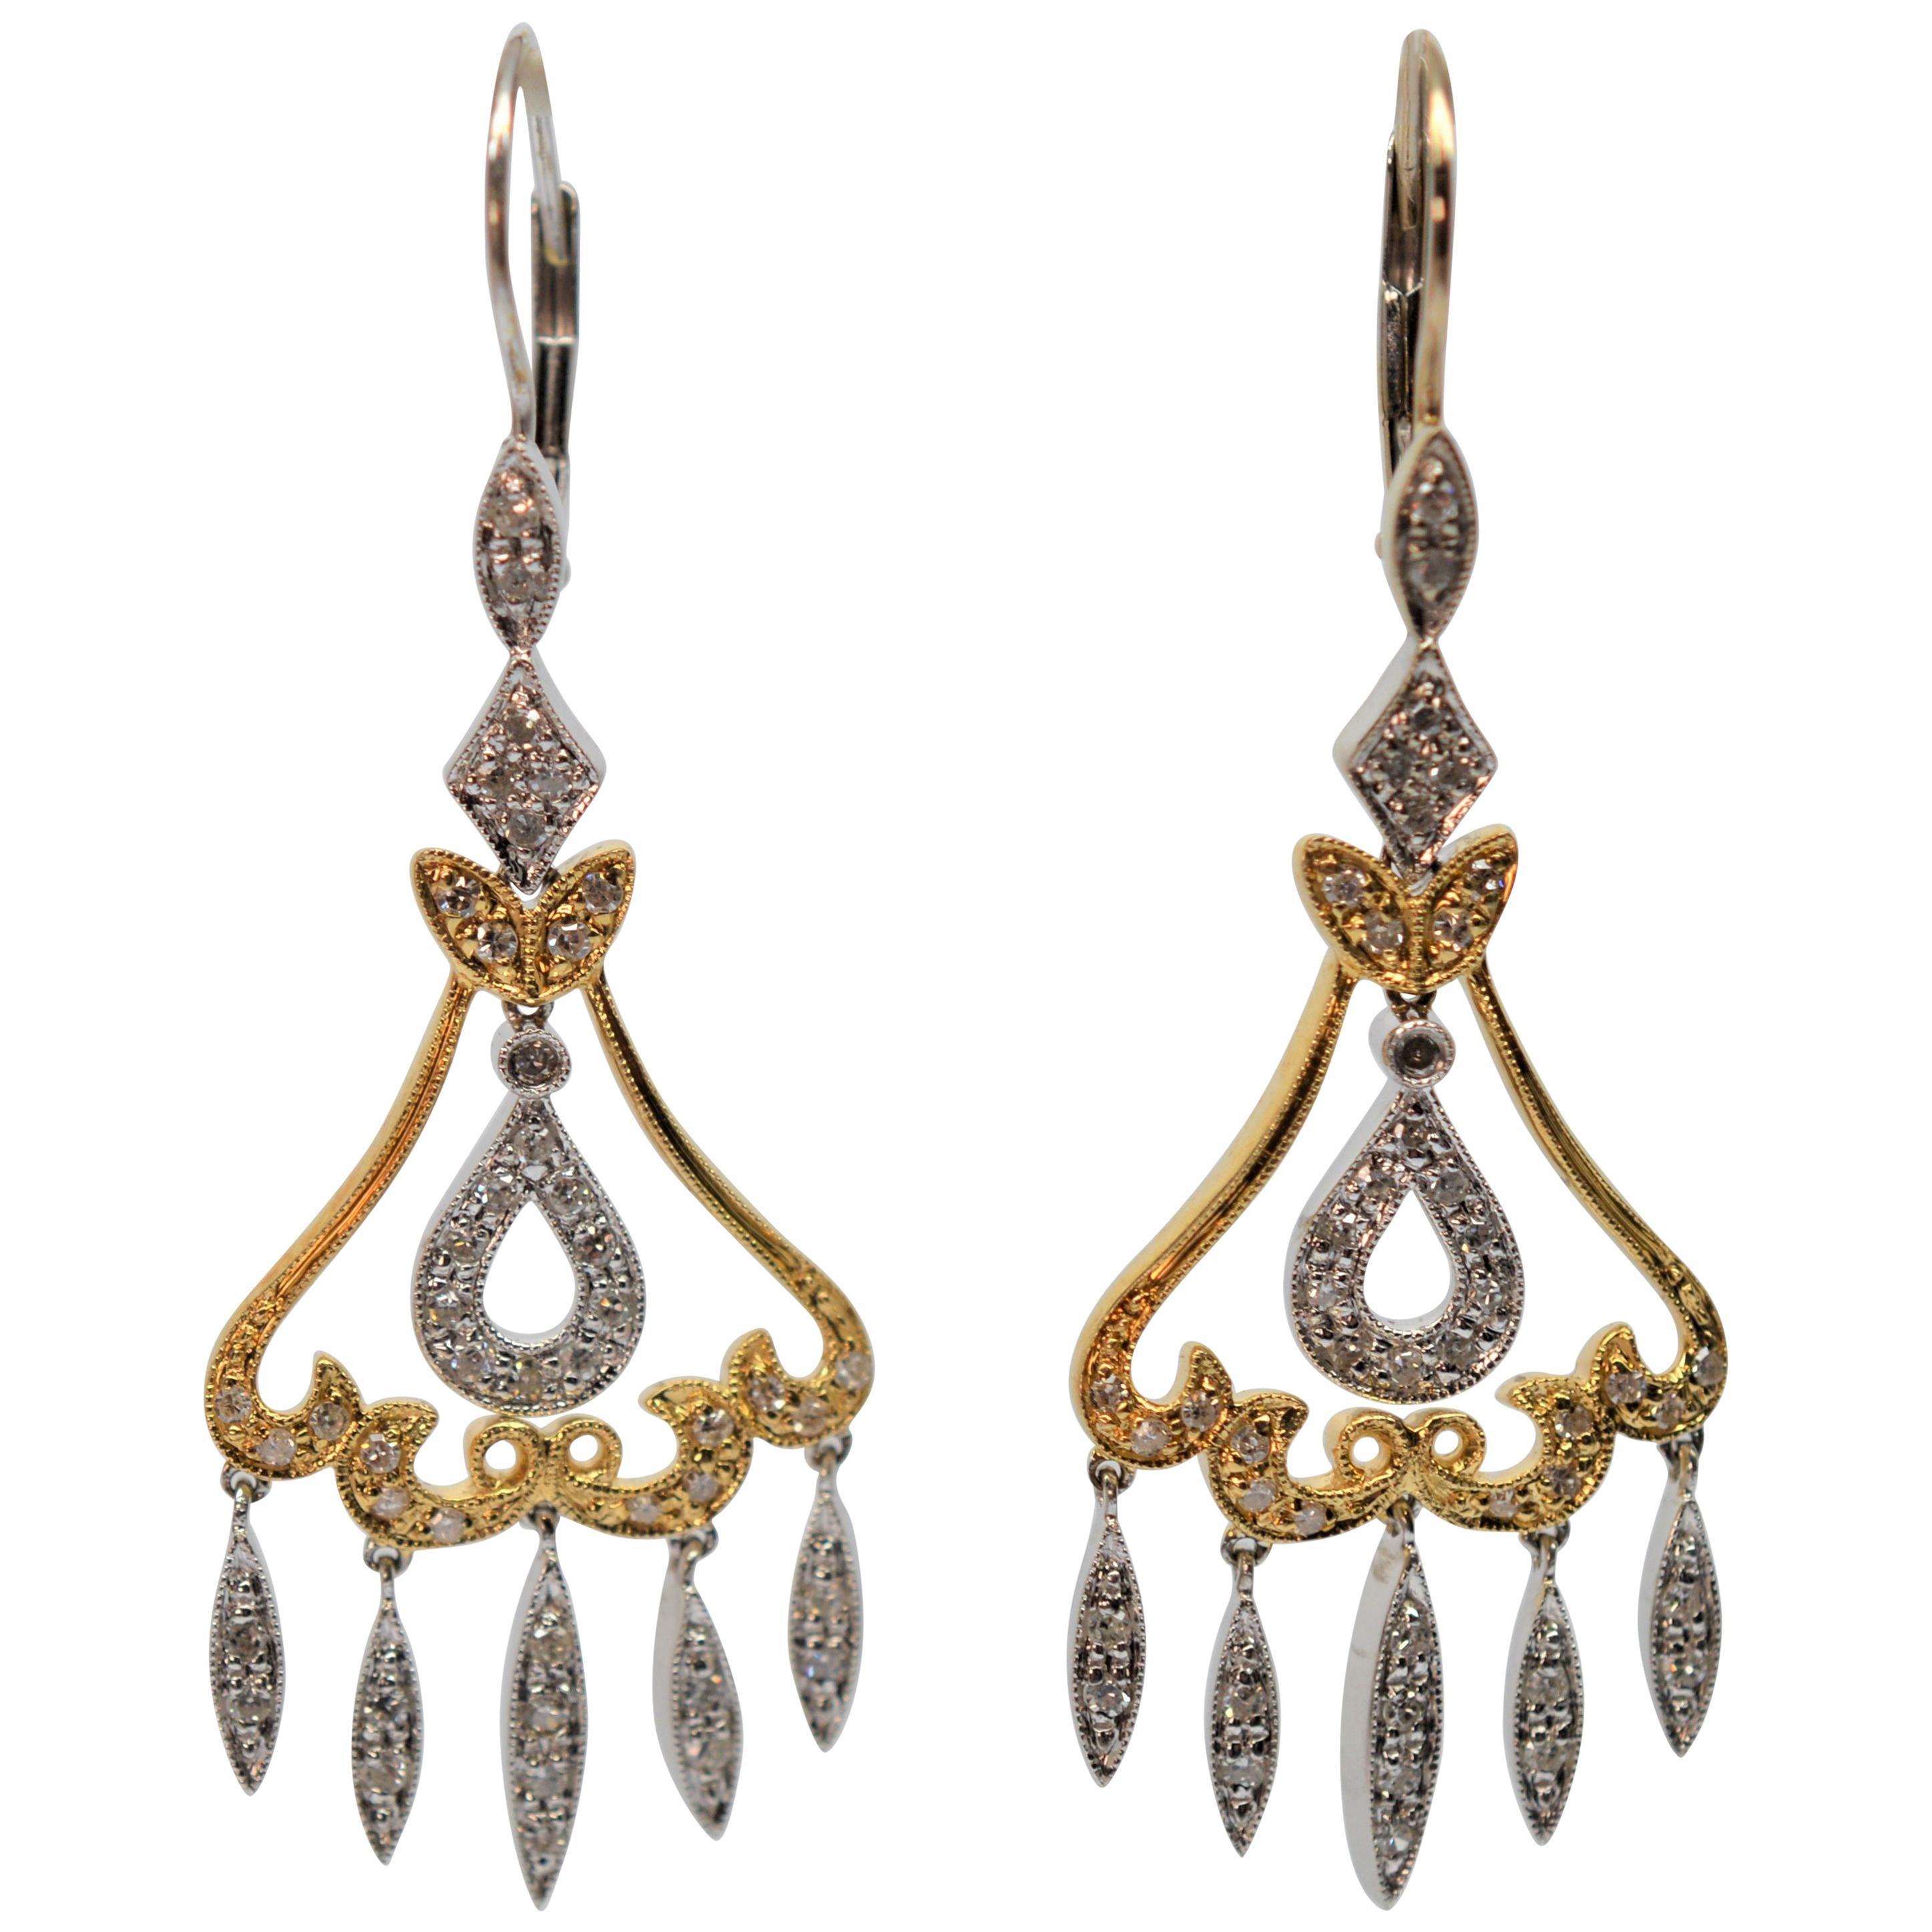 Antique Style 14 Karat White & Yellow Gold Diamond Chandelier Earrings